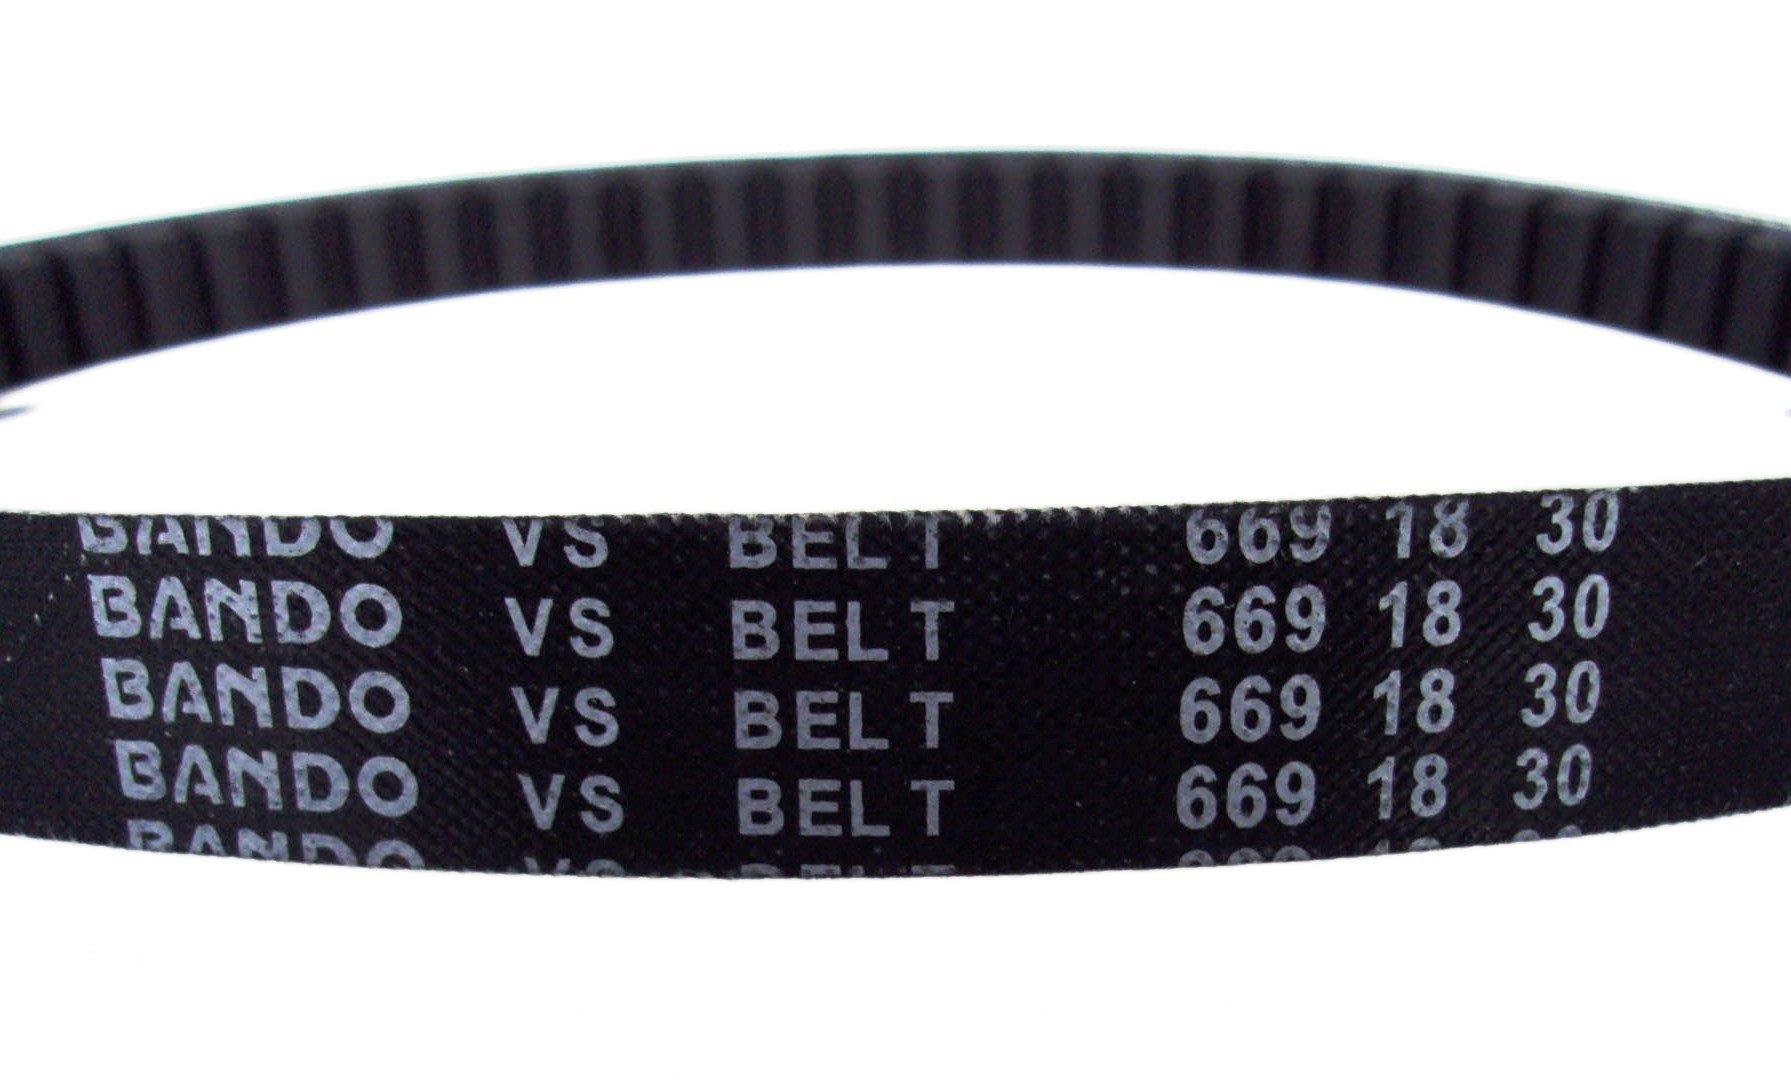 V-Belt CVT Drive Belt BANDO 669 18 30 fits GY6 50cc 4 stroke QMB139 Scooter Moped ATV